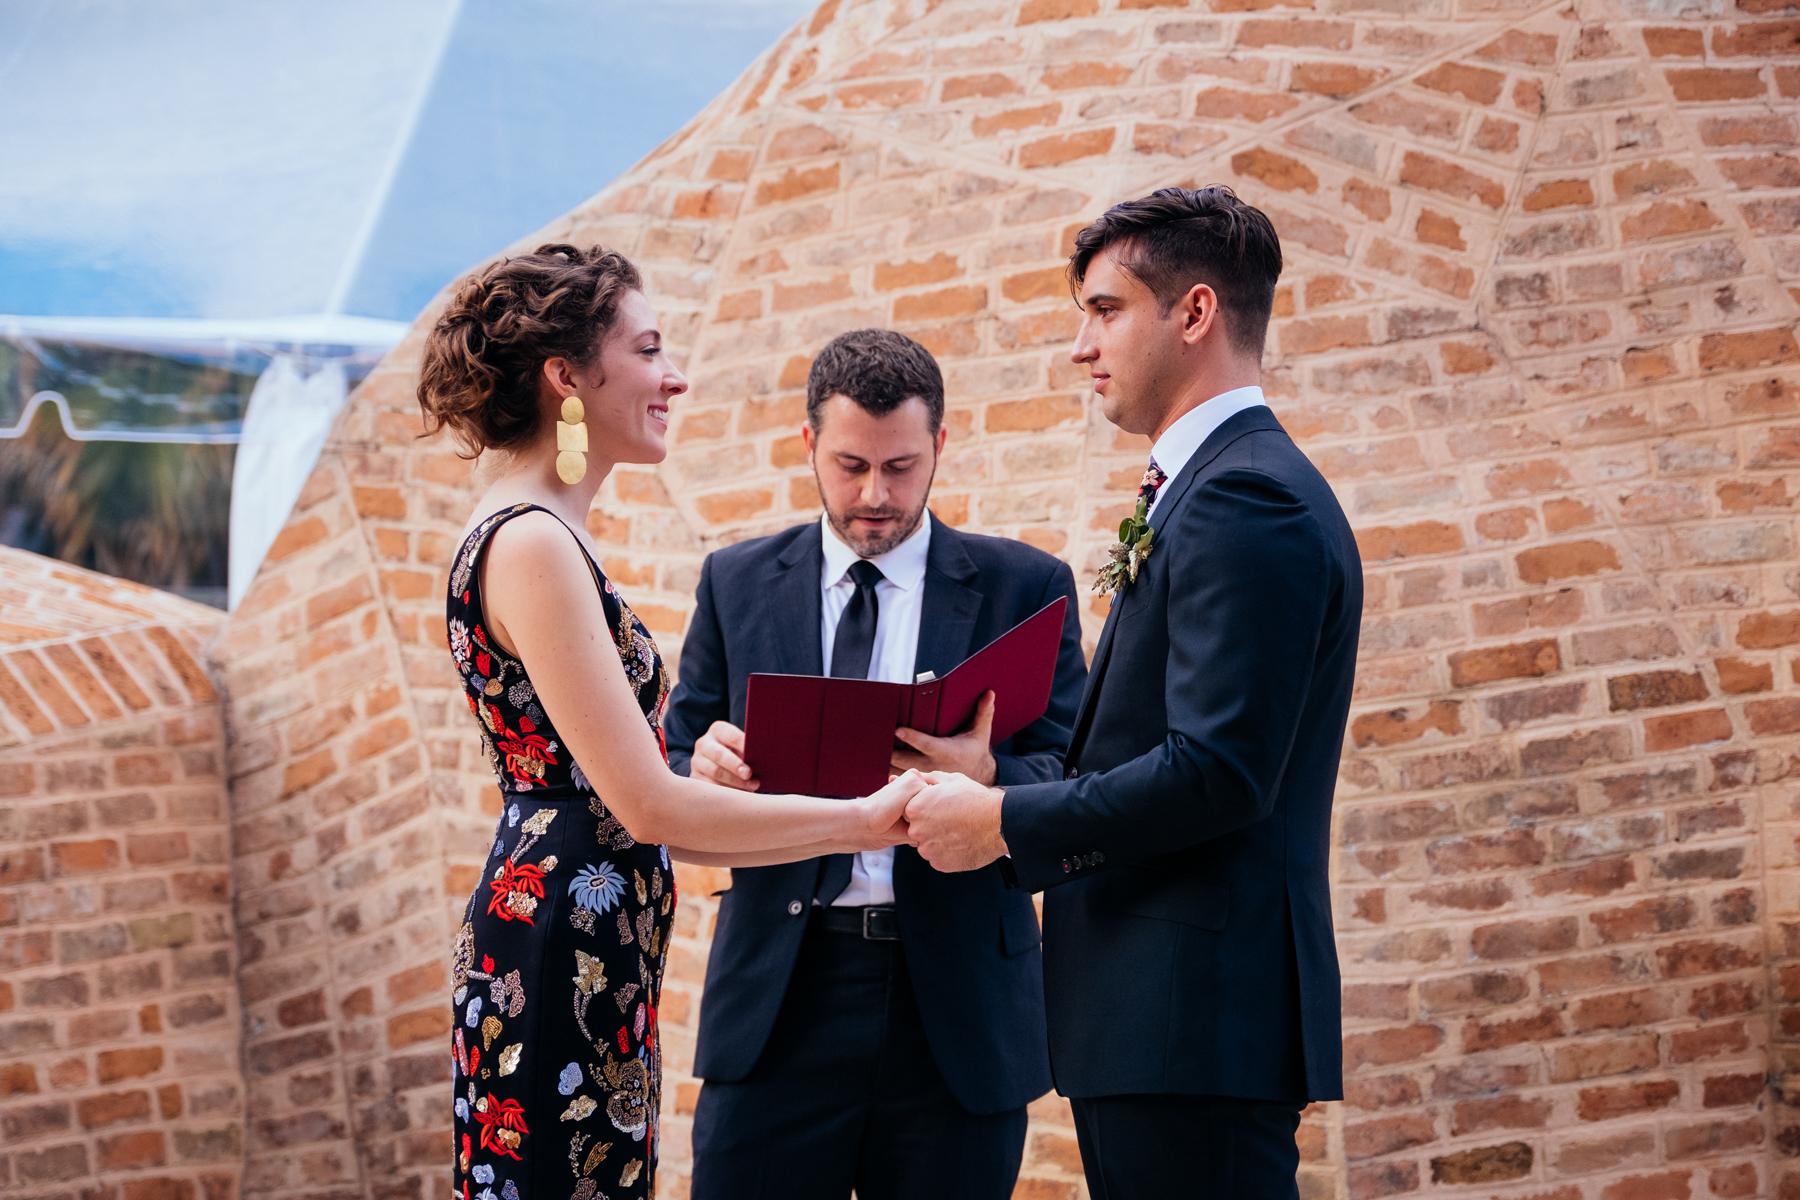 Simms_wedding-8.jpg